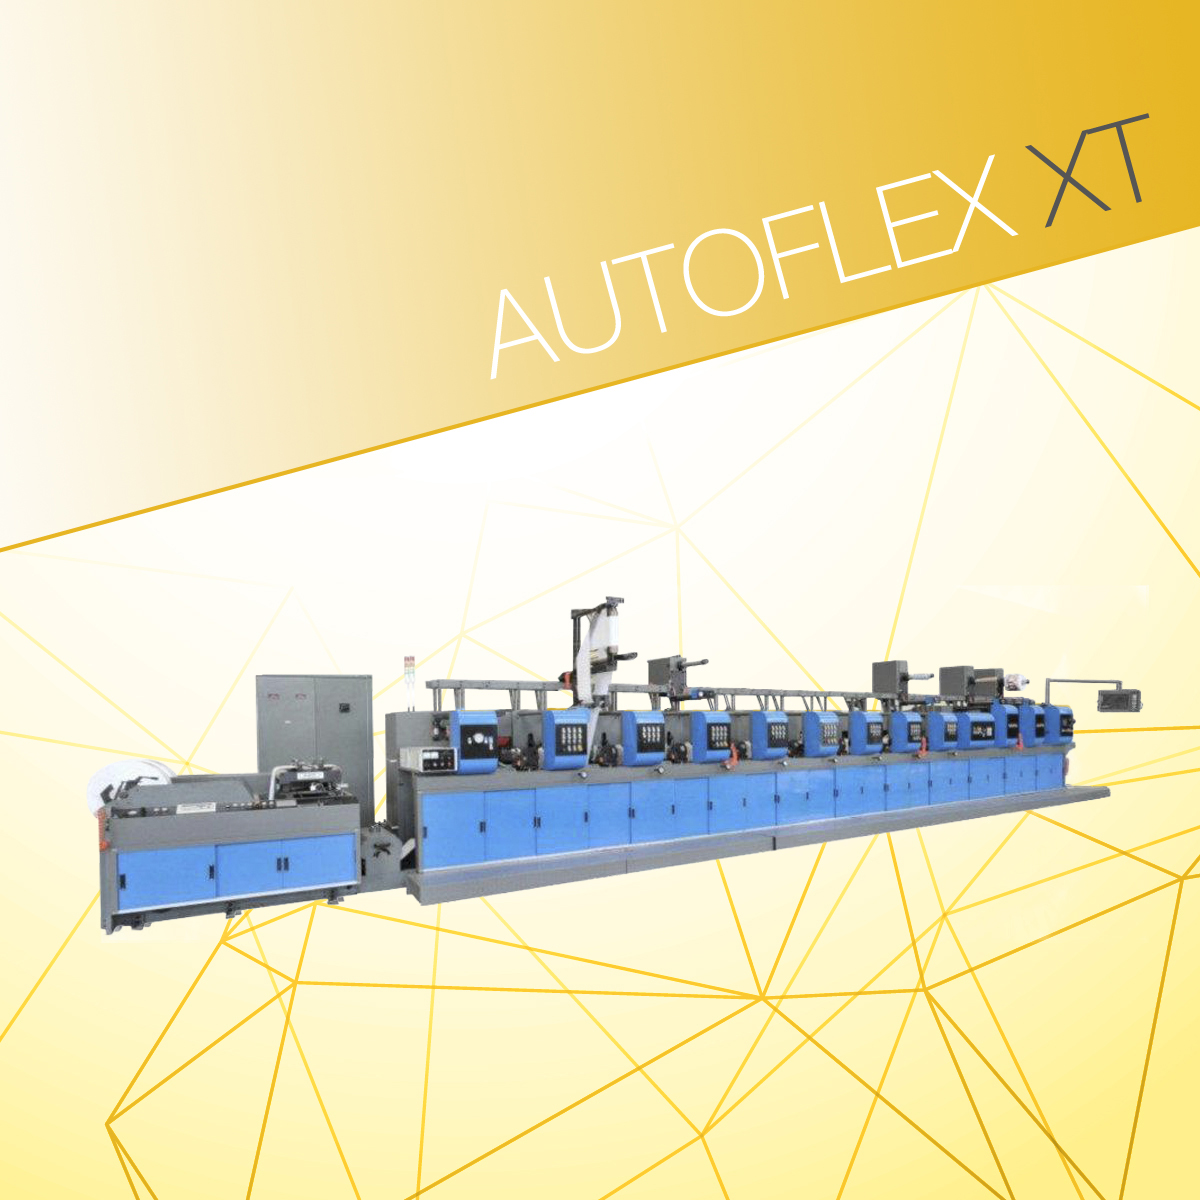 Autoflex XT.jpg